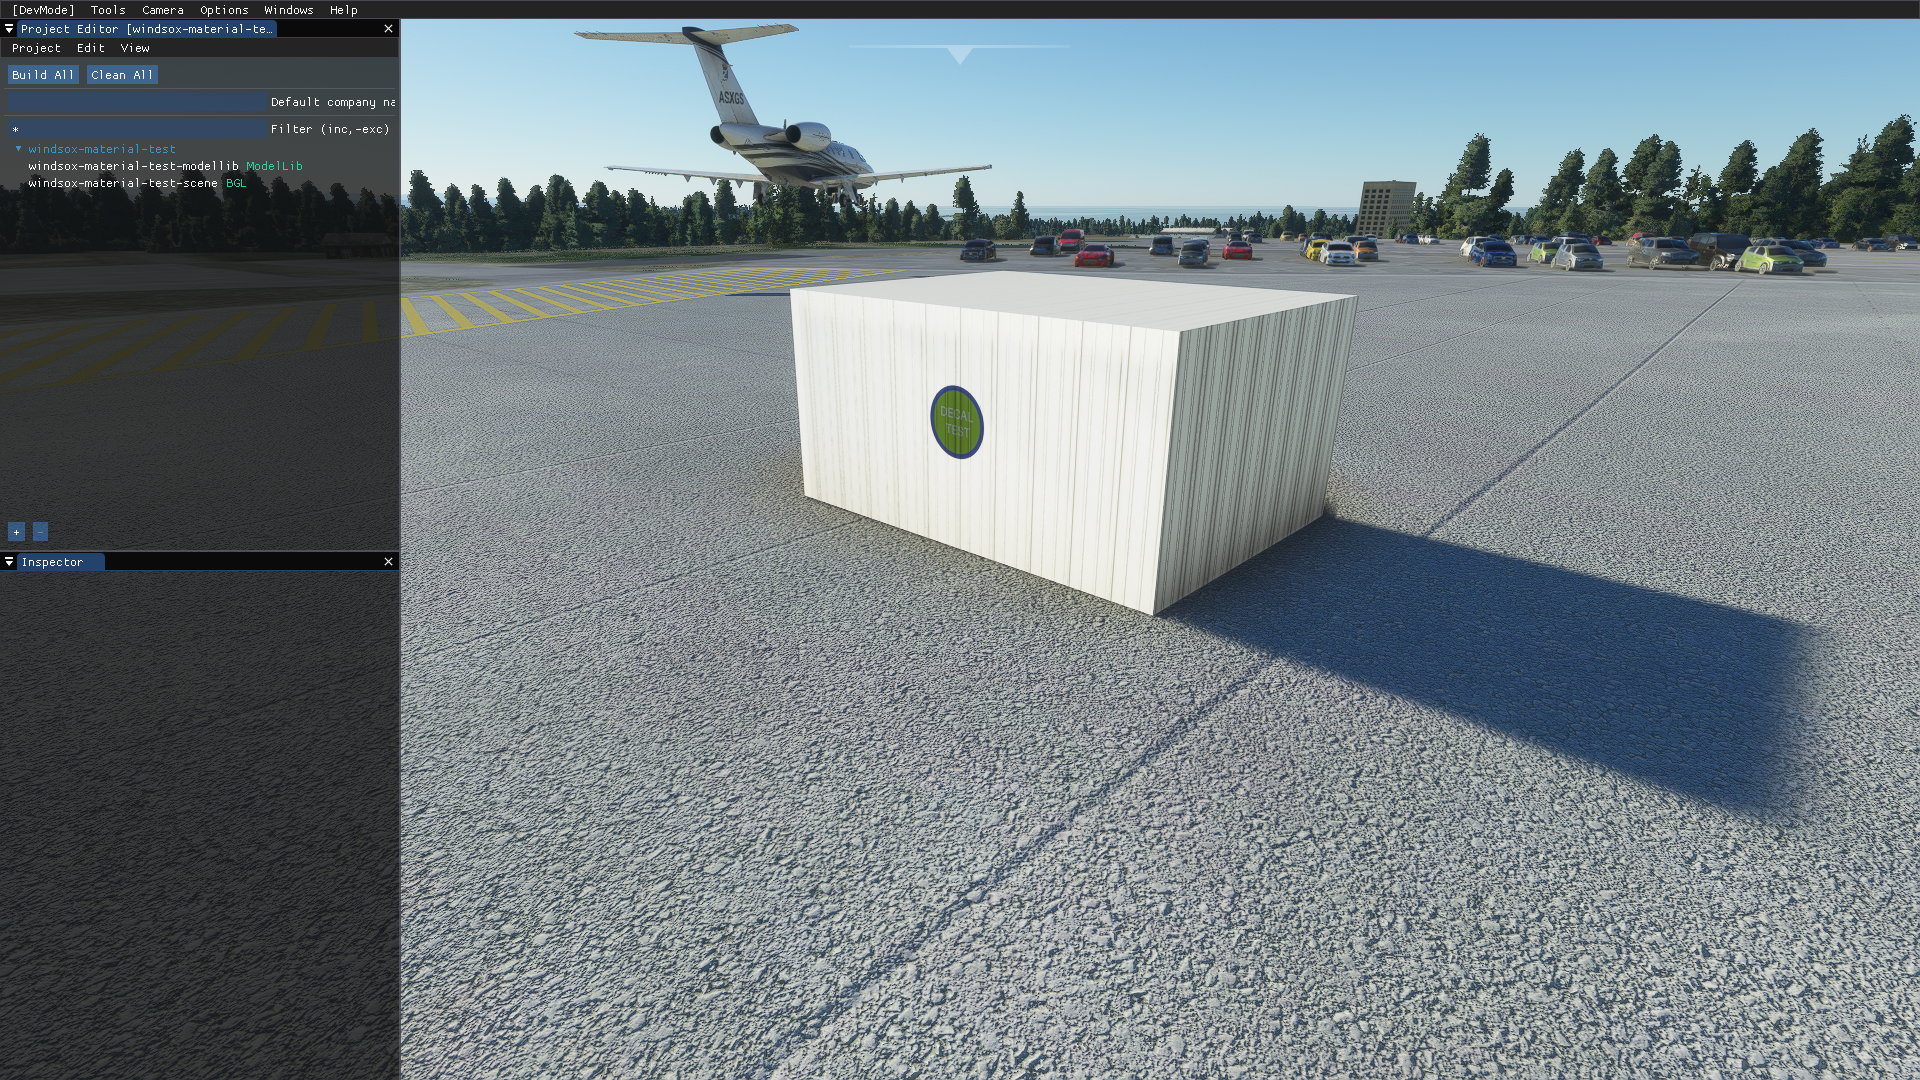 Microsoft Flight Simulator Screenshot 2020.11.23 - 16.38.33.91.png